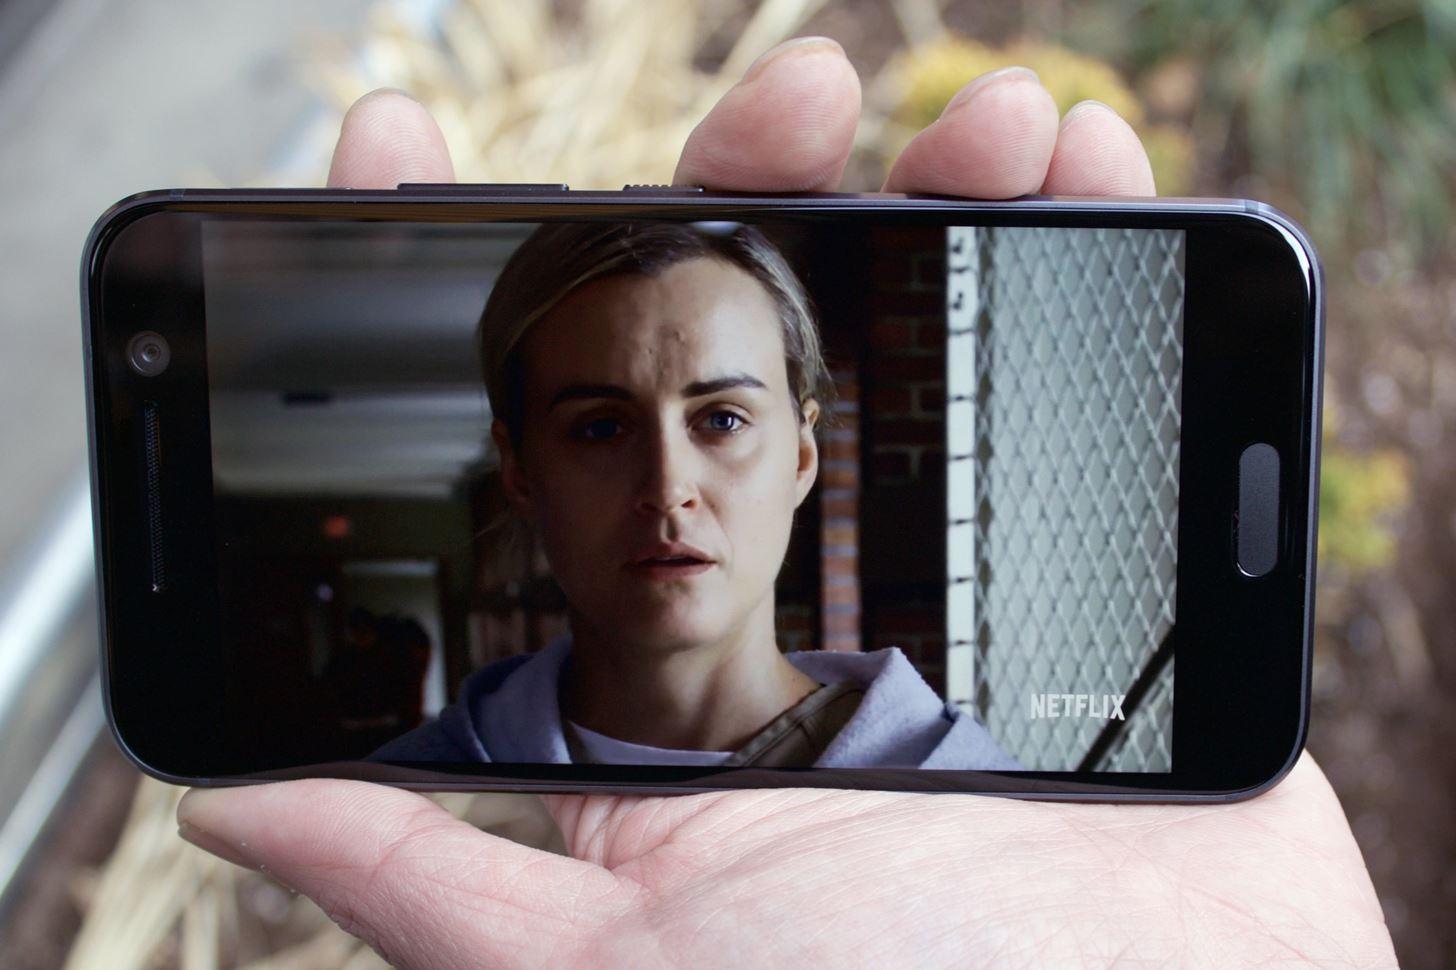 The 4 Best Phones for Binge-Watching Netflix & Hulu